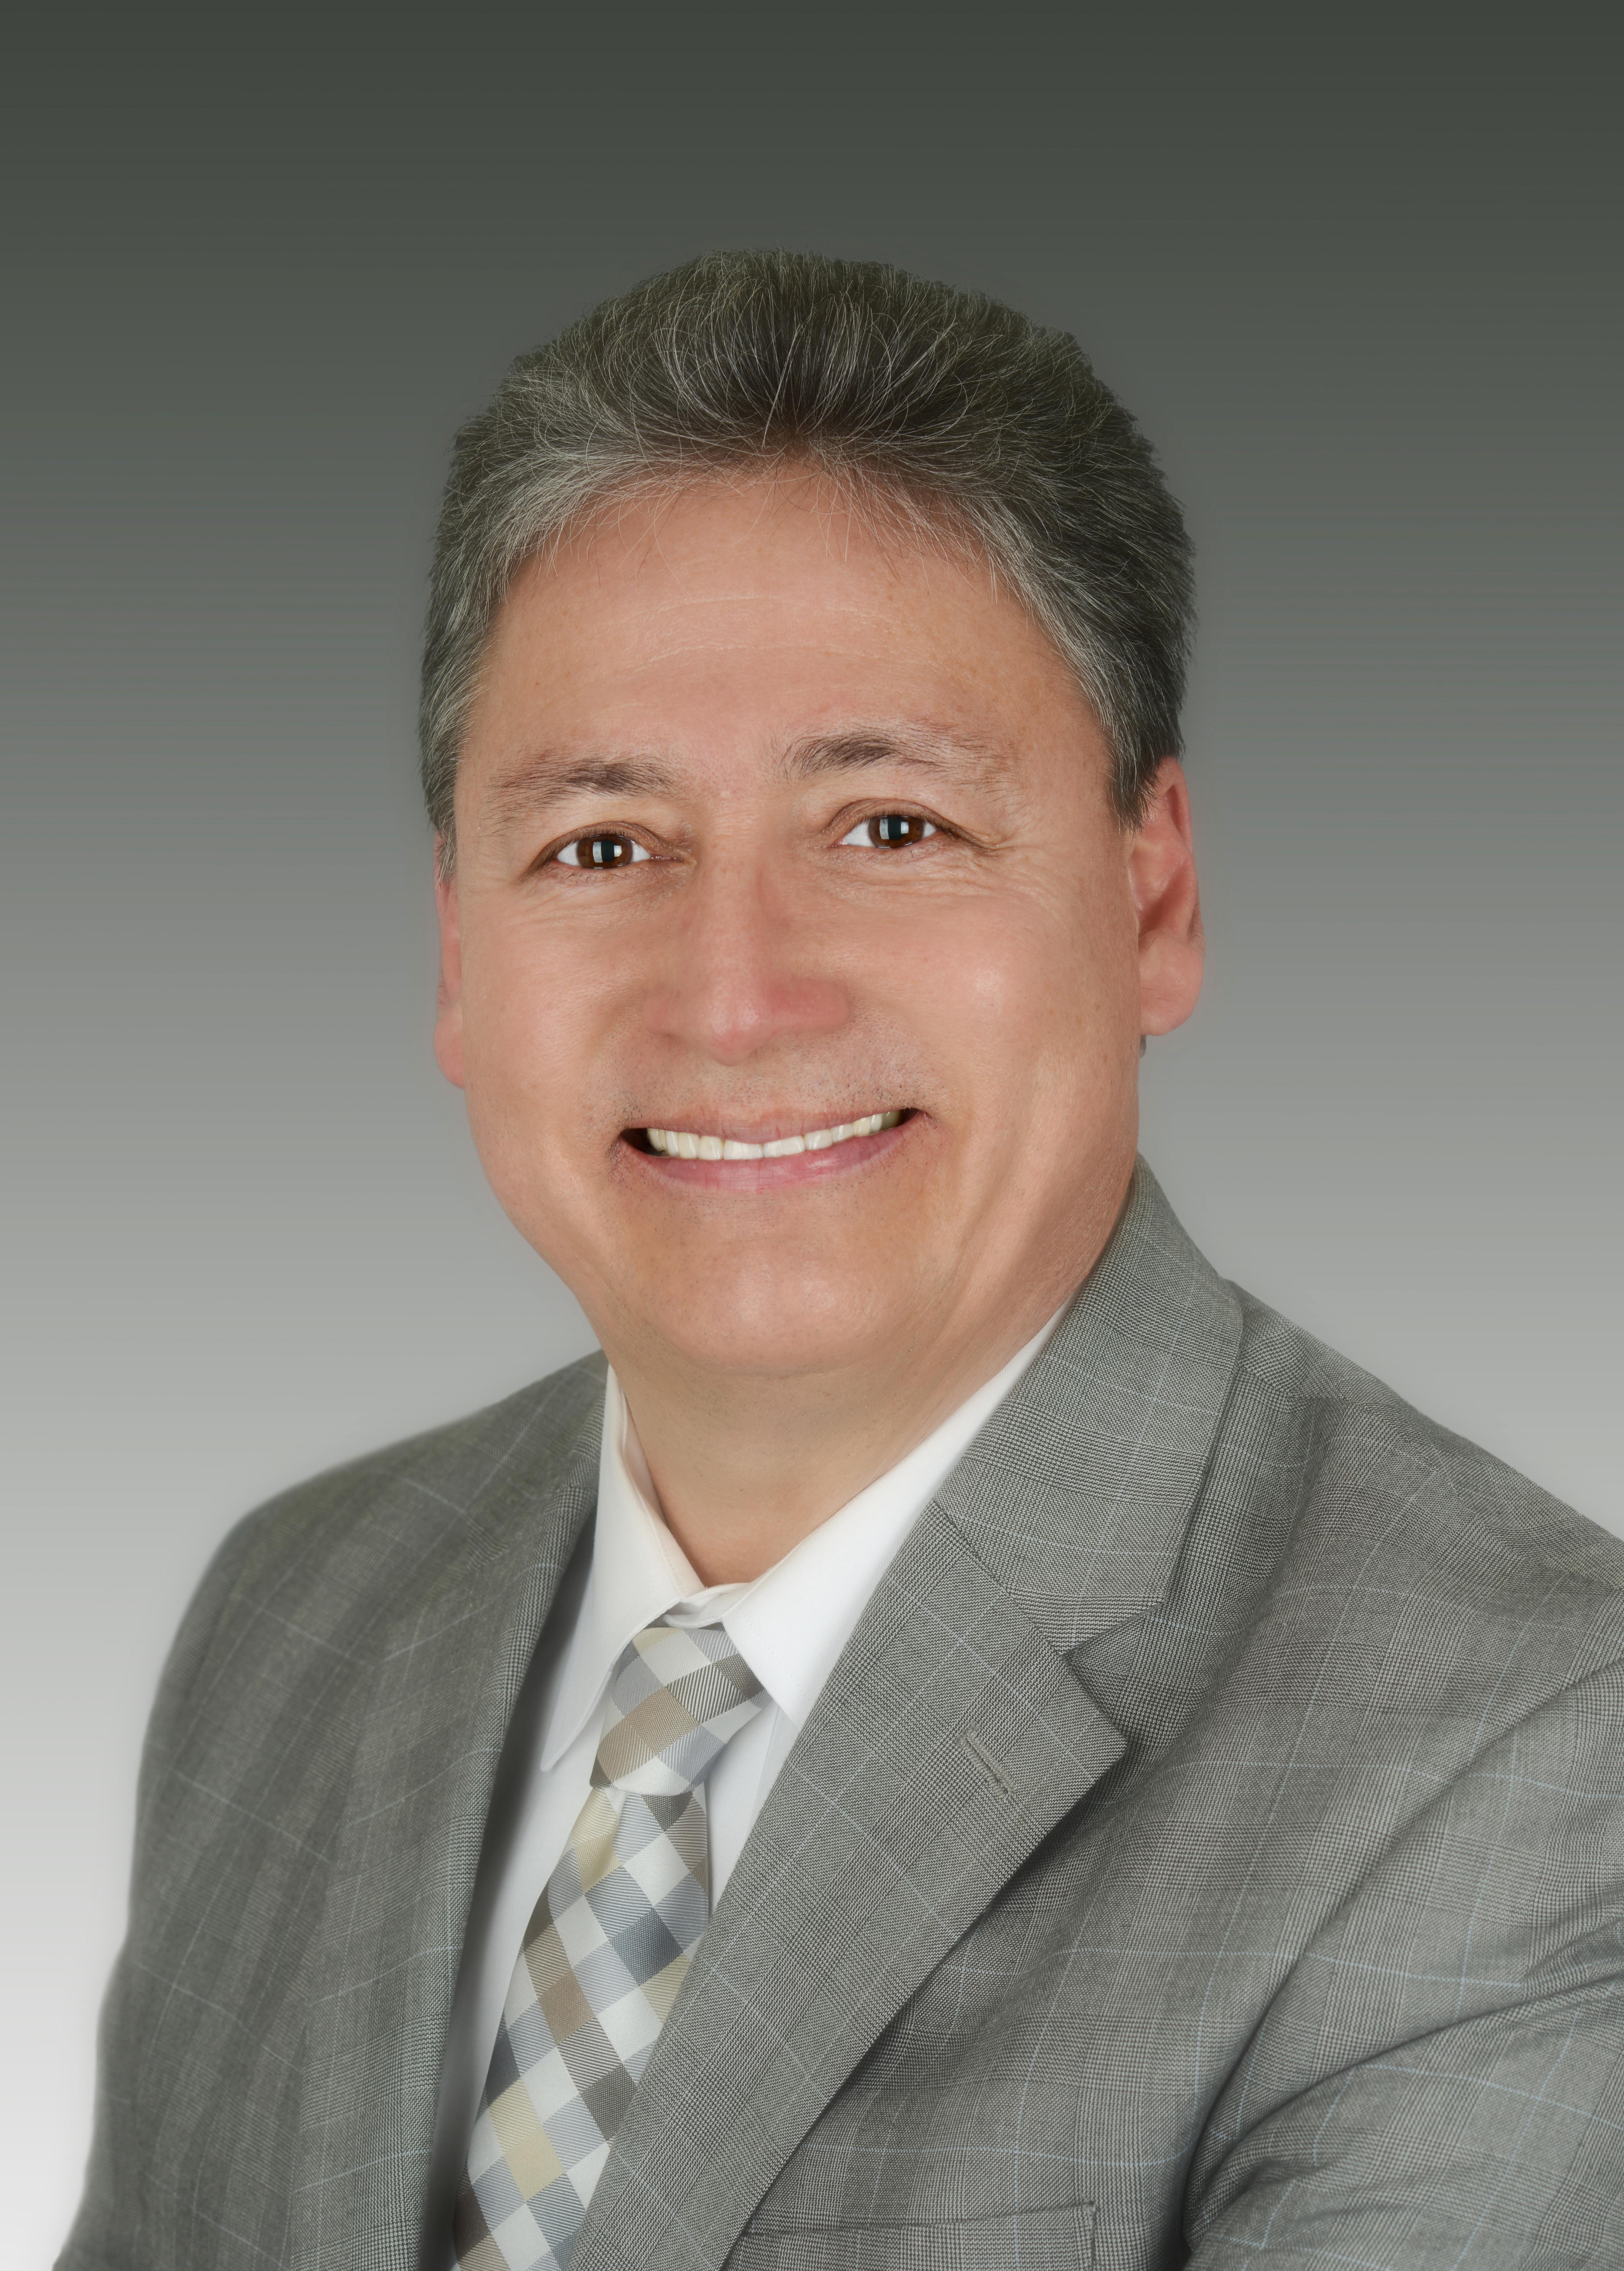 Edgar Molina